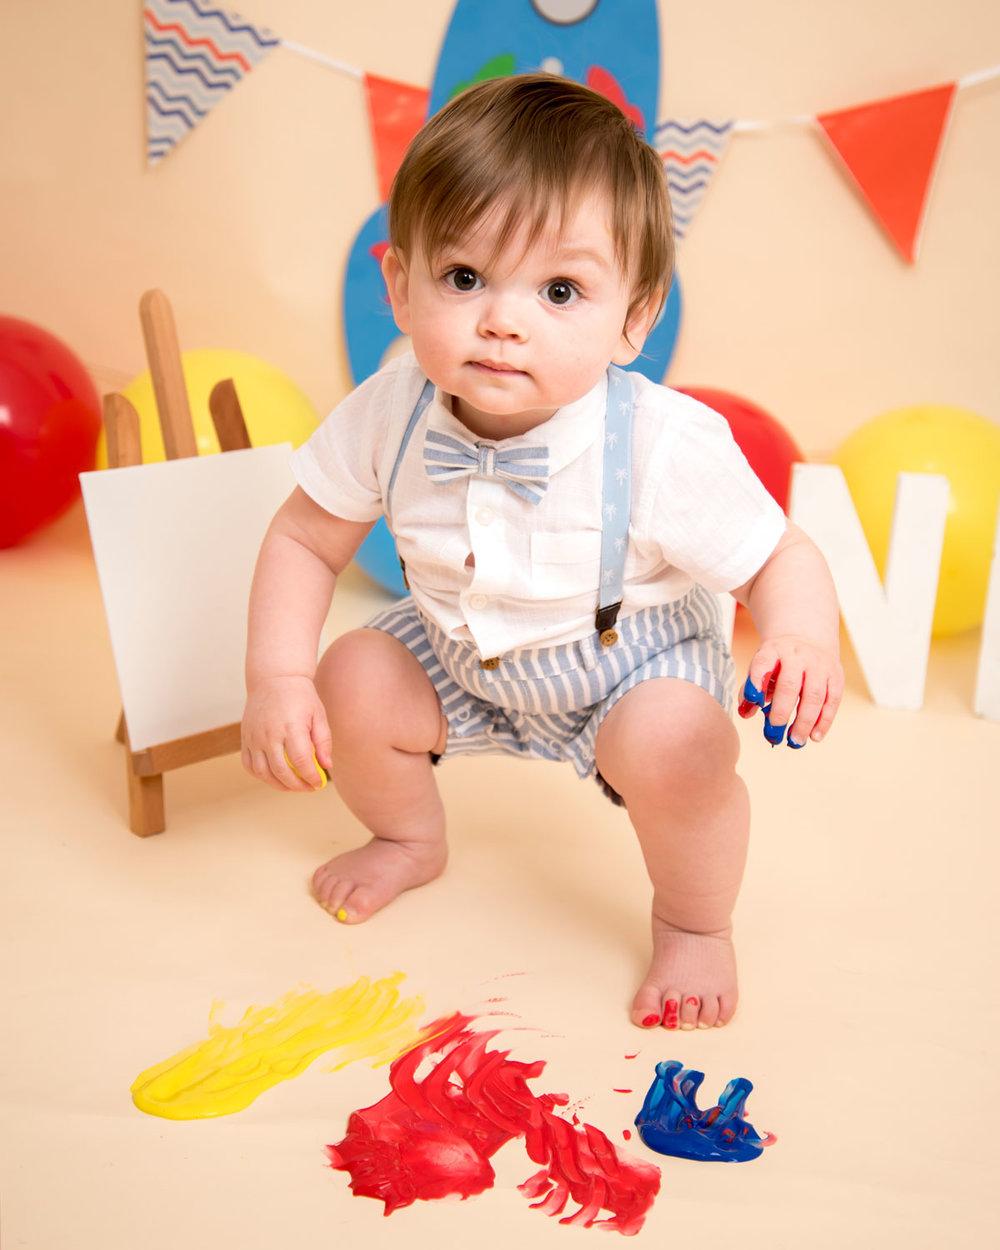 Baby_cake_smash_photography_Ely_Cambridgeshire_paint_splash_cake_smash_alternative_messy_play_first_birthday_for_milo (2).jpg